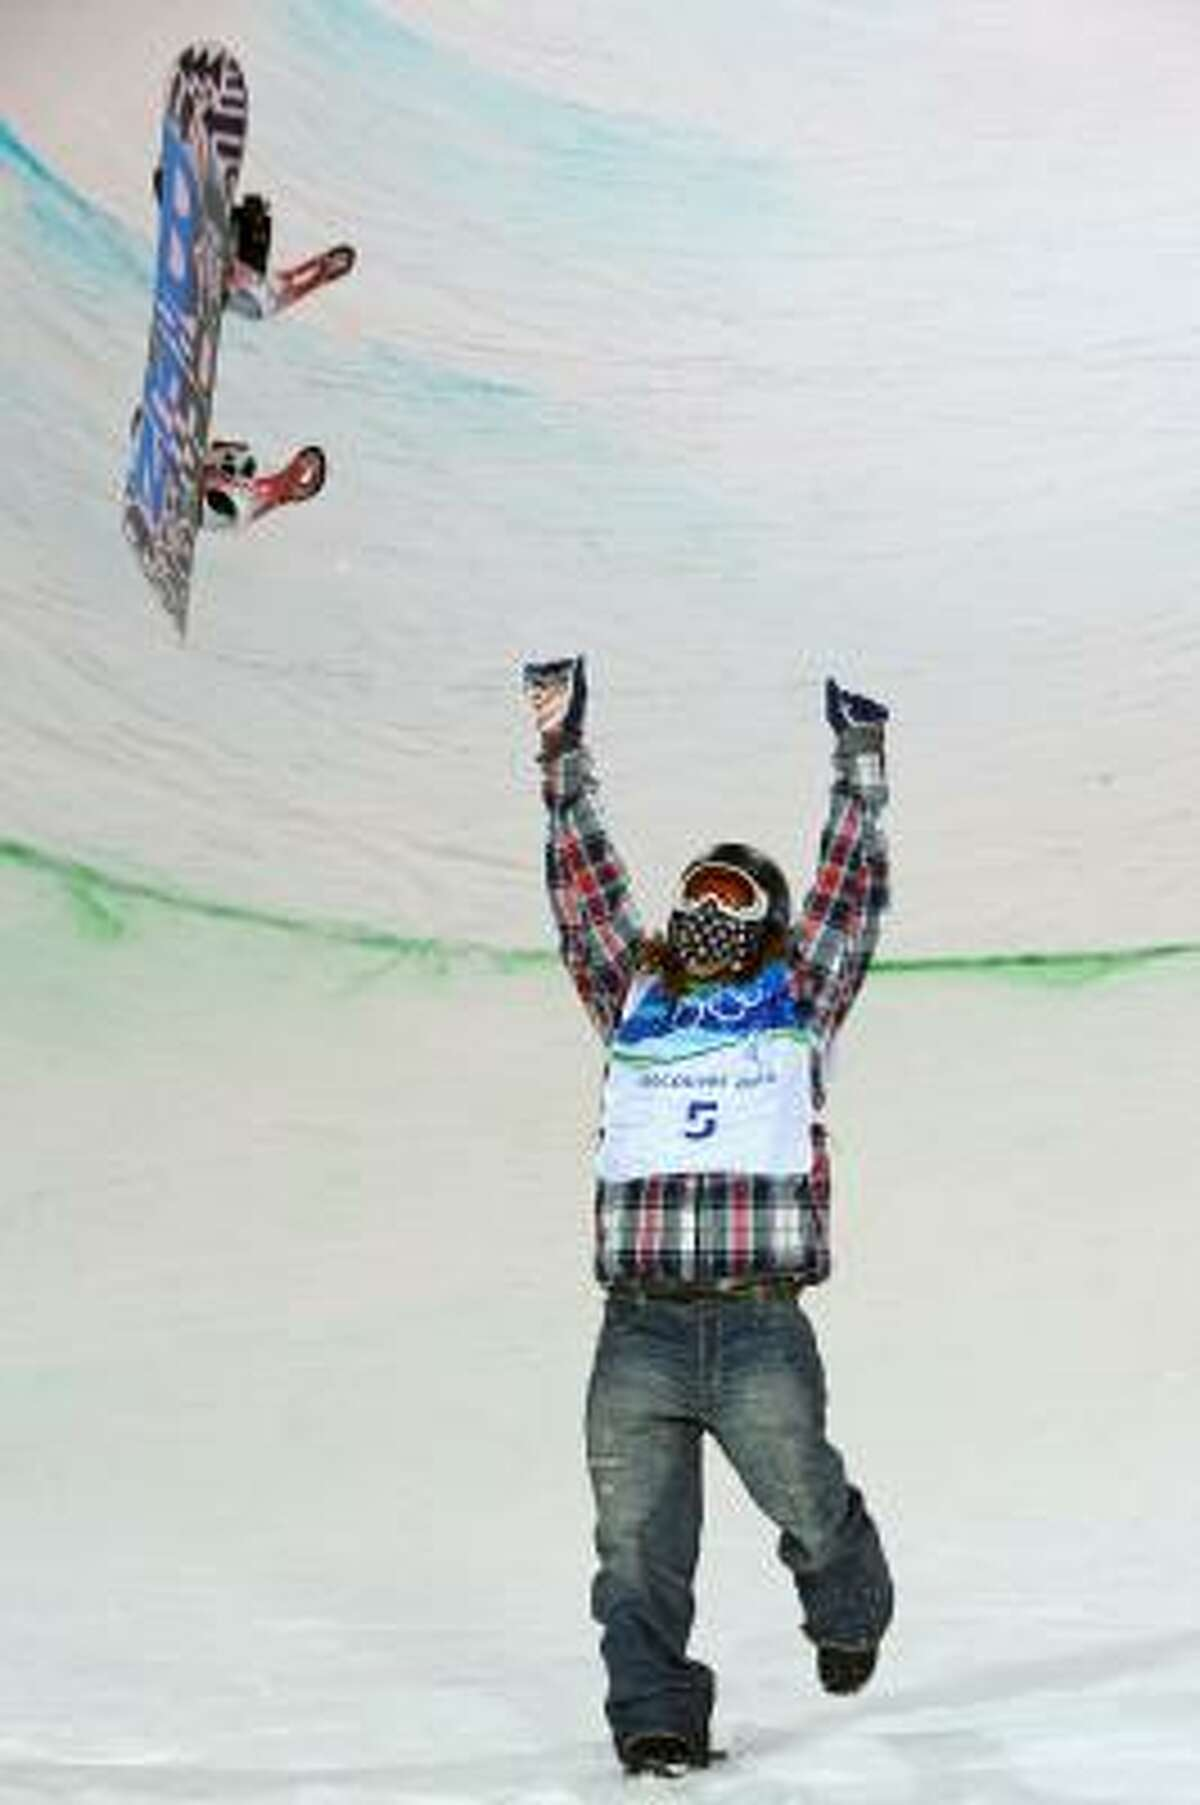 U.S. gold medalist Shaun White celebrates after the men's snowboard halfpipe final run.